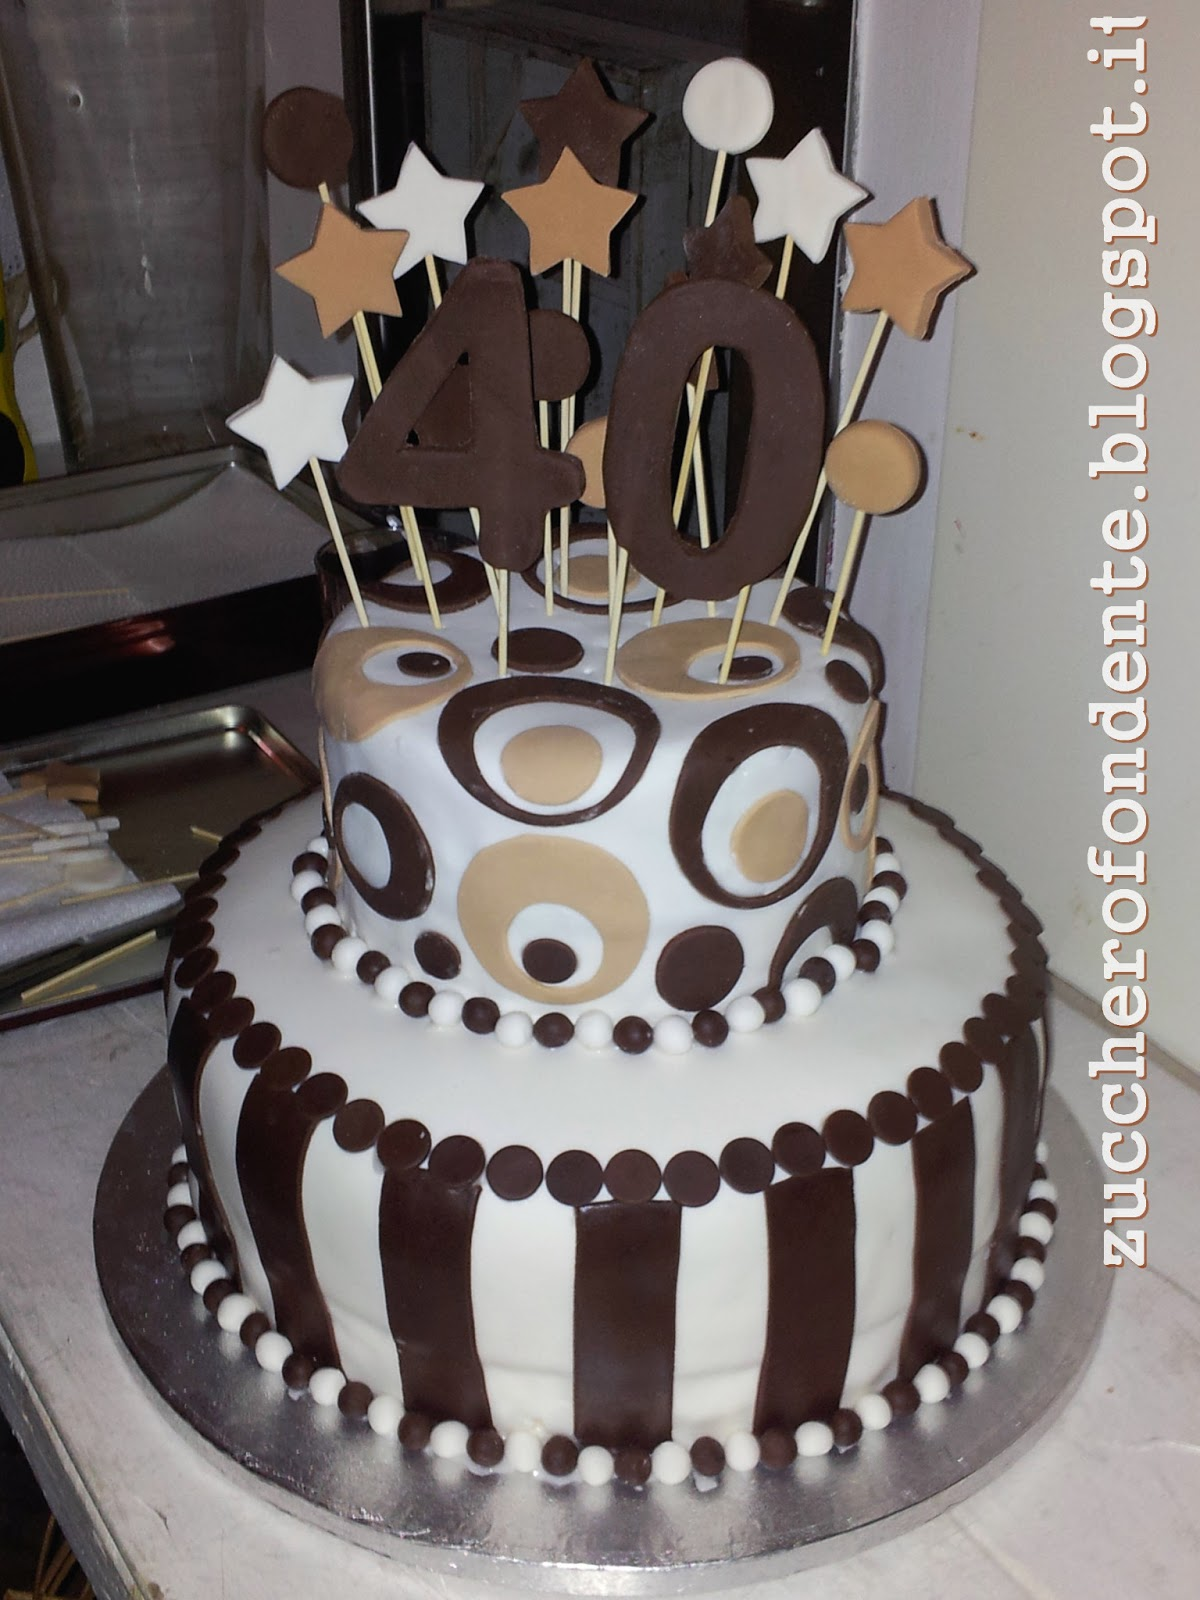 Zuccherofondente torta 40 anni a due piani for Torte di compleanno a due piani semplici